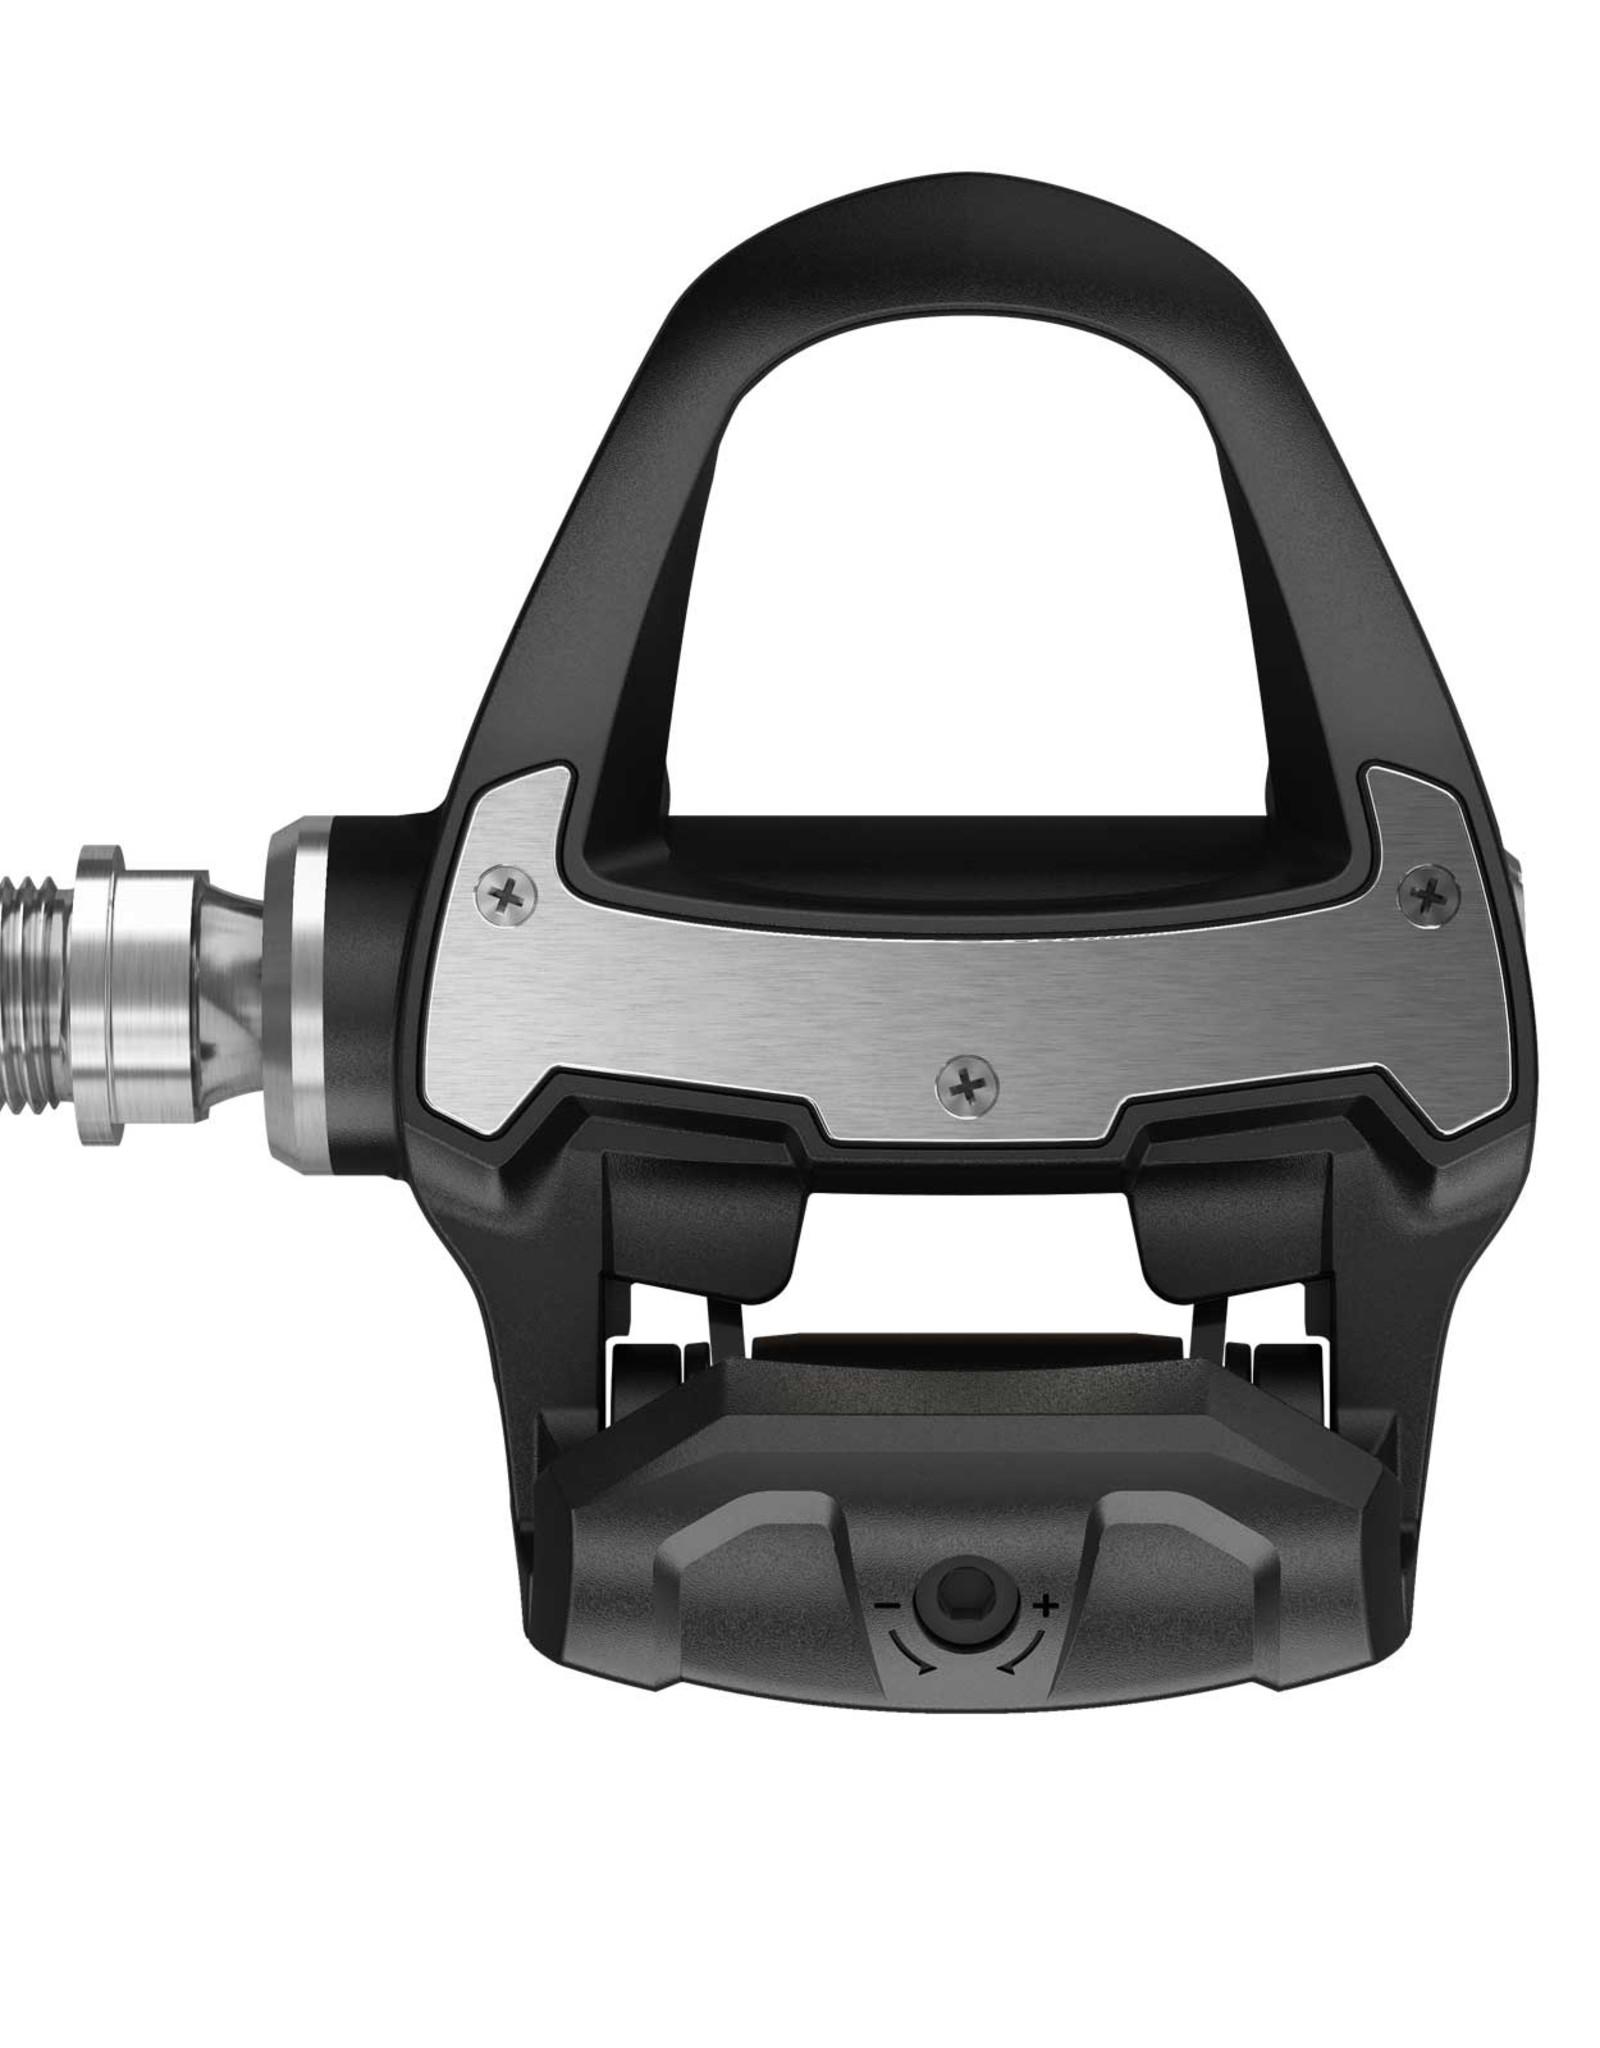 Garmin Garmin Rally RS100 Single power meter pedal